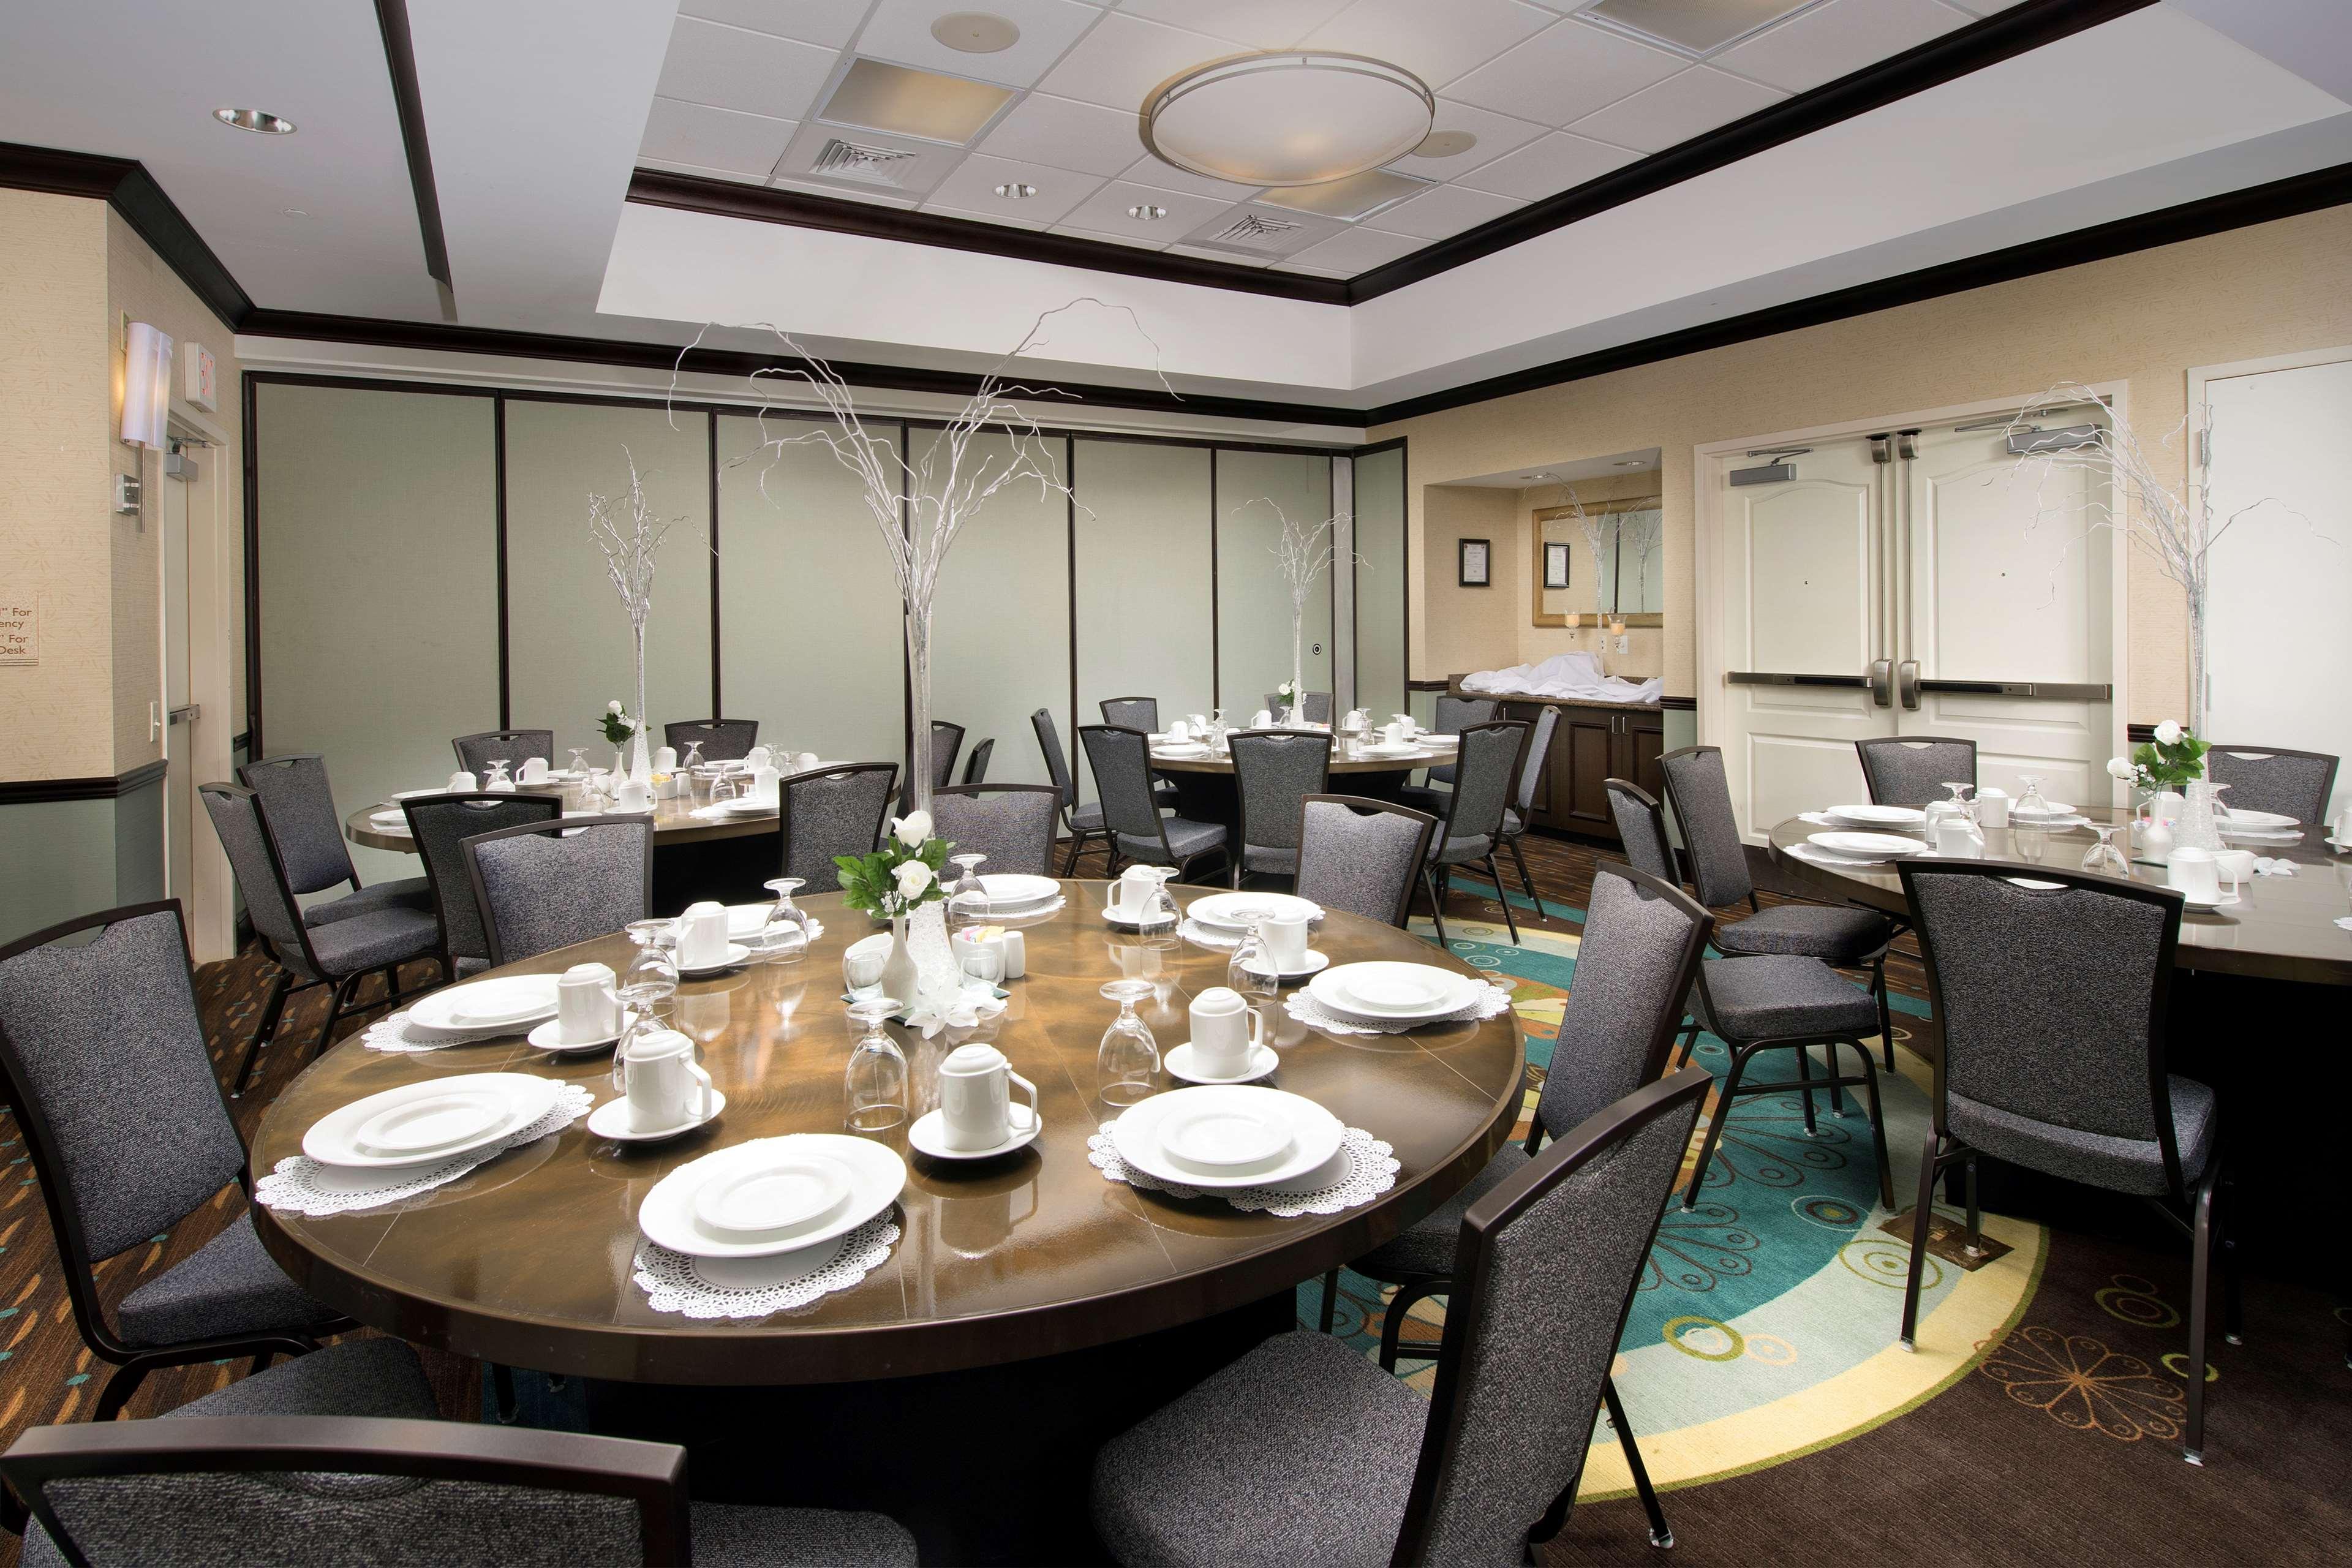 Hilton Garden Inn Winston-Salem/Hanes Mall image 25